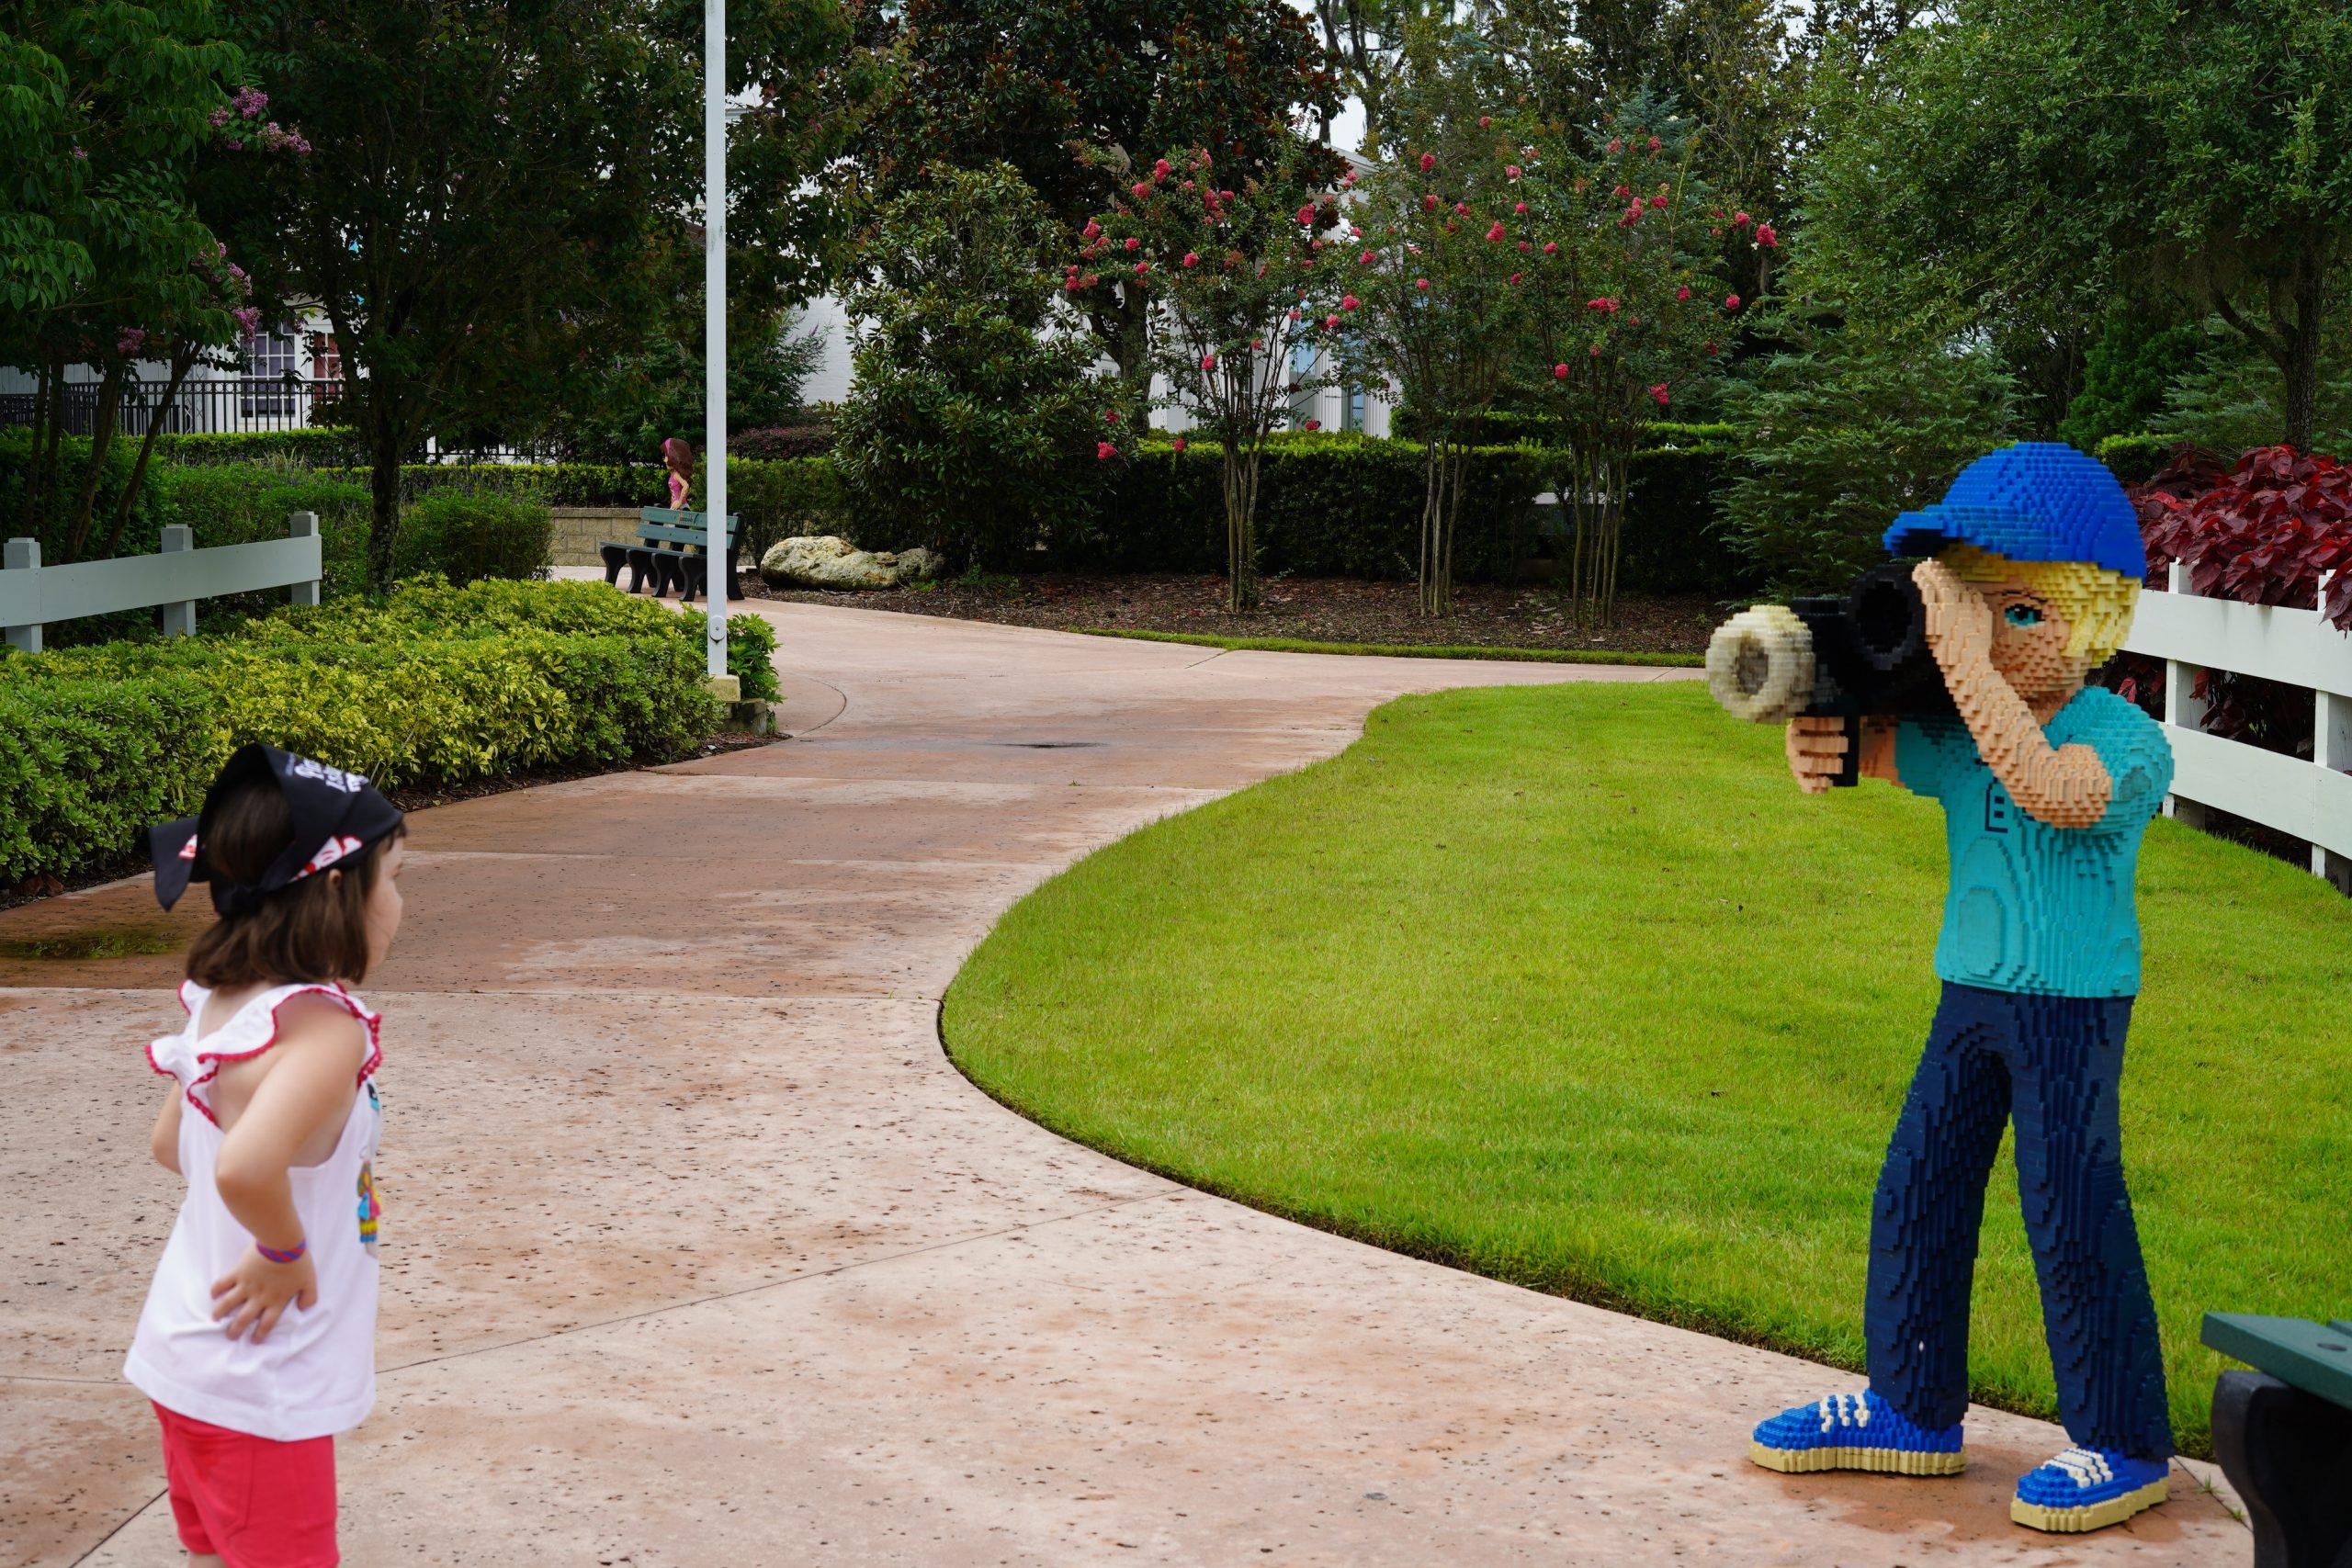 Little girl posing for a lego camera man at LEGOLAND. | Guide to LEGOLAND Florida